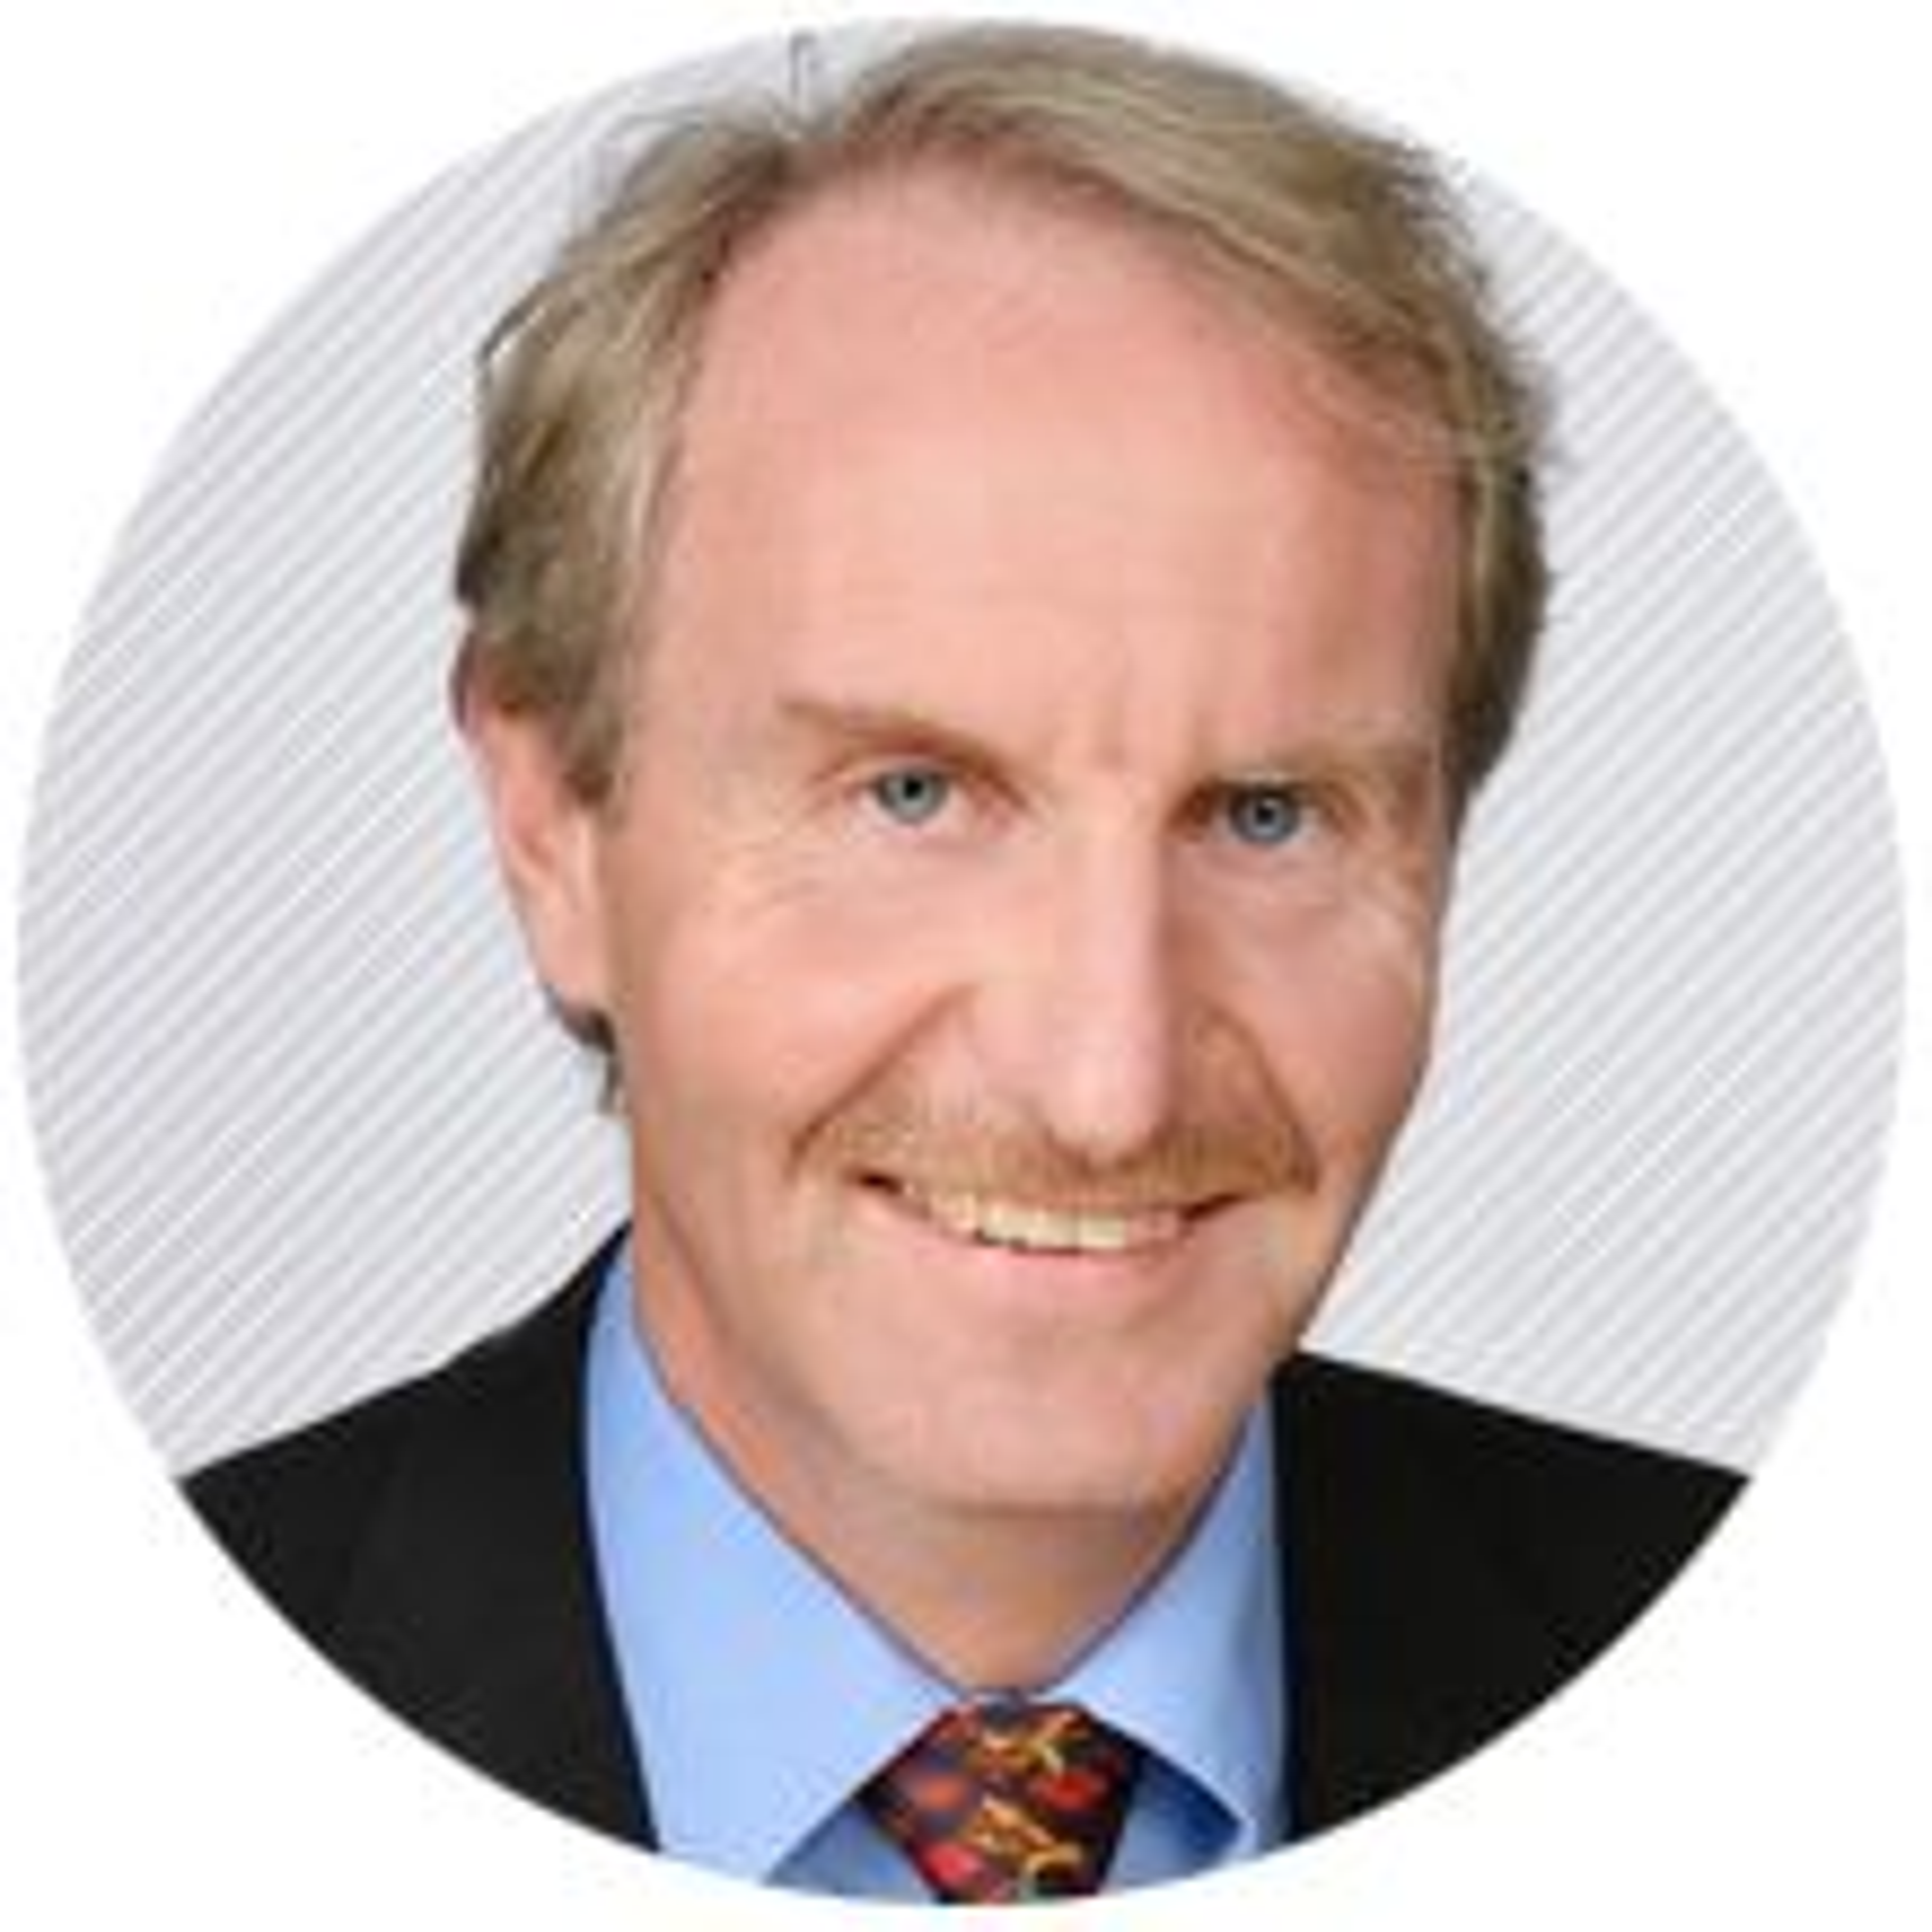 Olav Johannessen